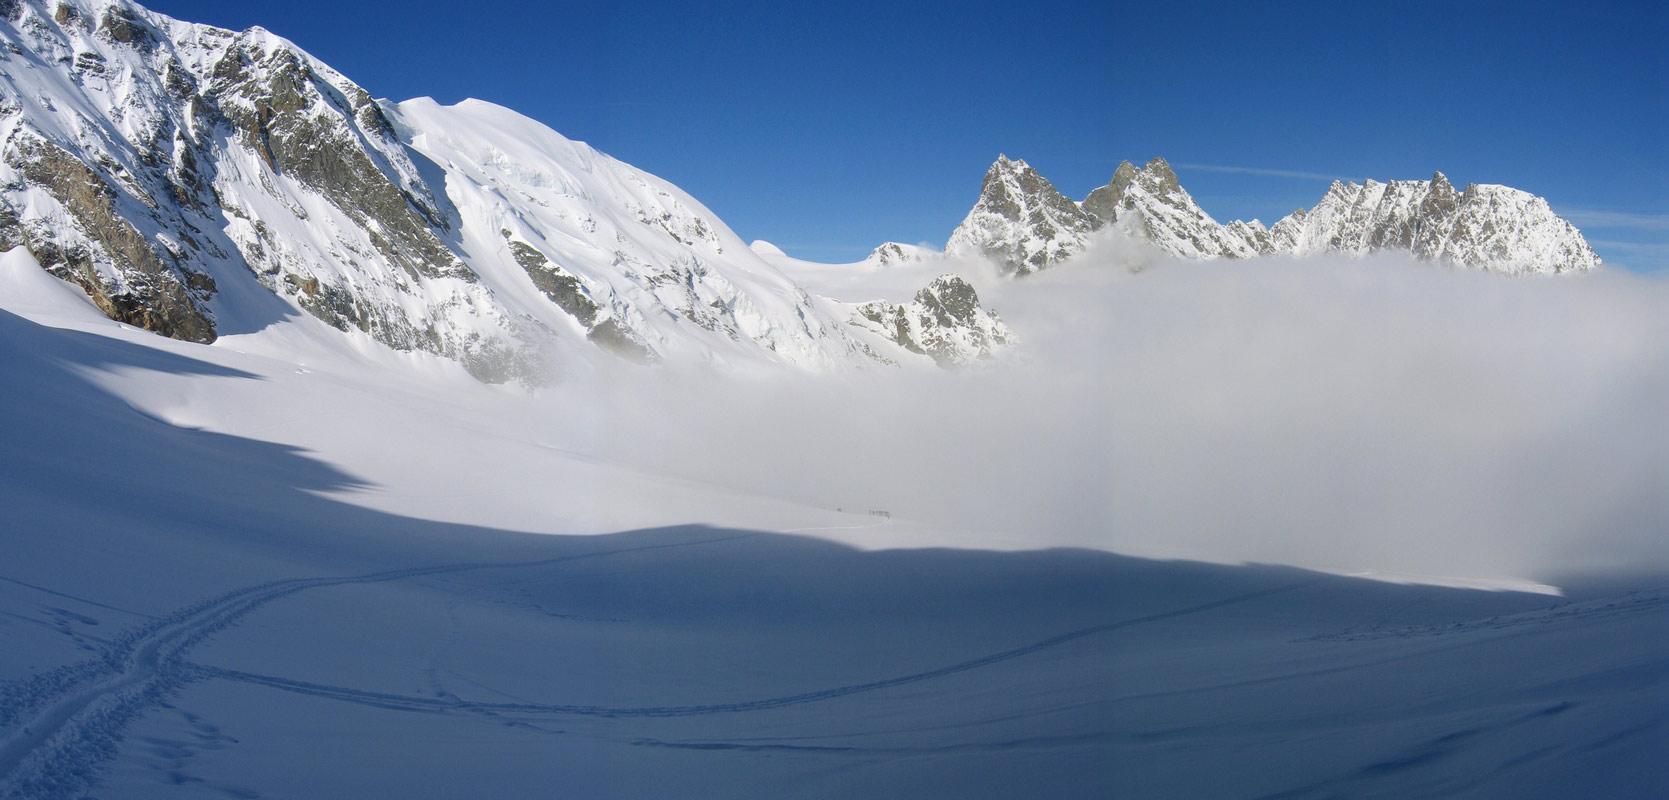 Col Valpelline, Day 6 H.R. Chamonix-Zermatt Walliser Alpen / Alpes valaisannes Švýcarsko panorama 38